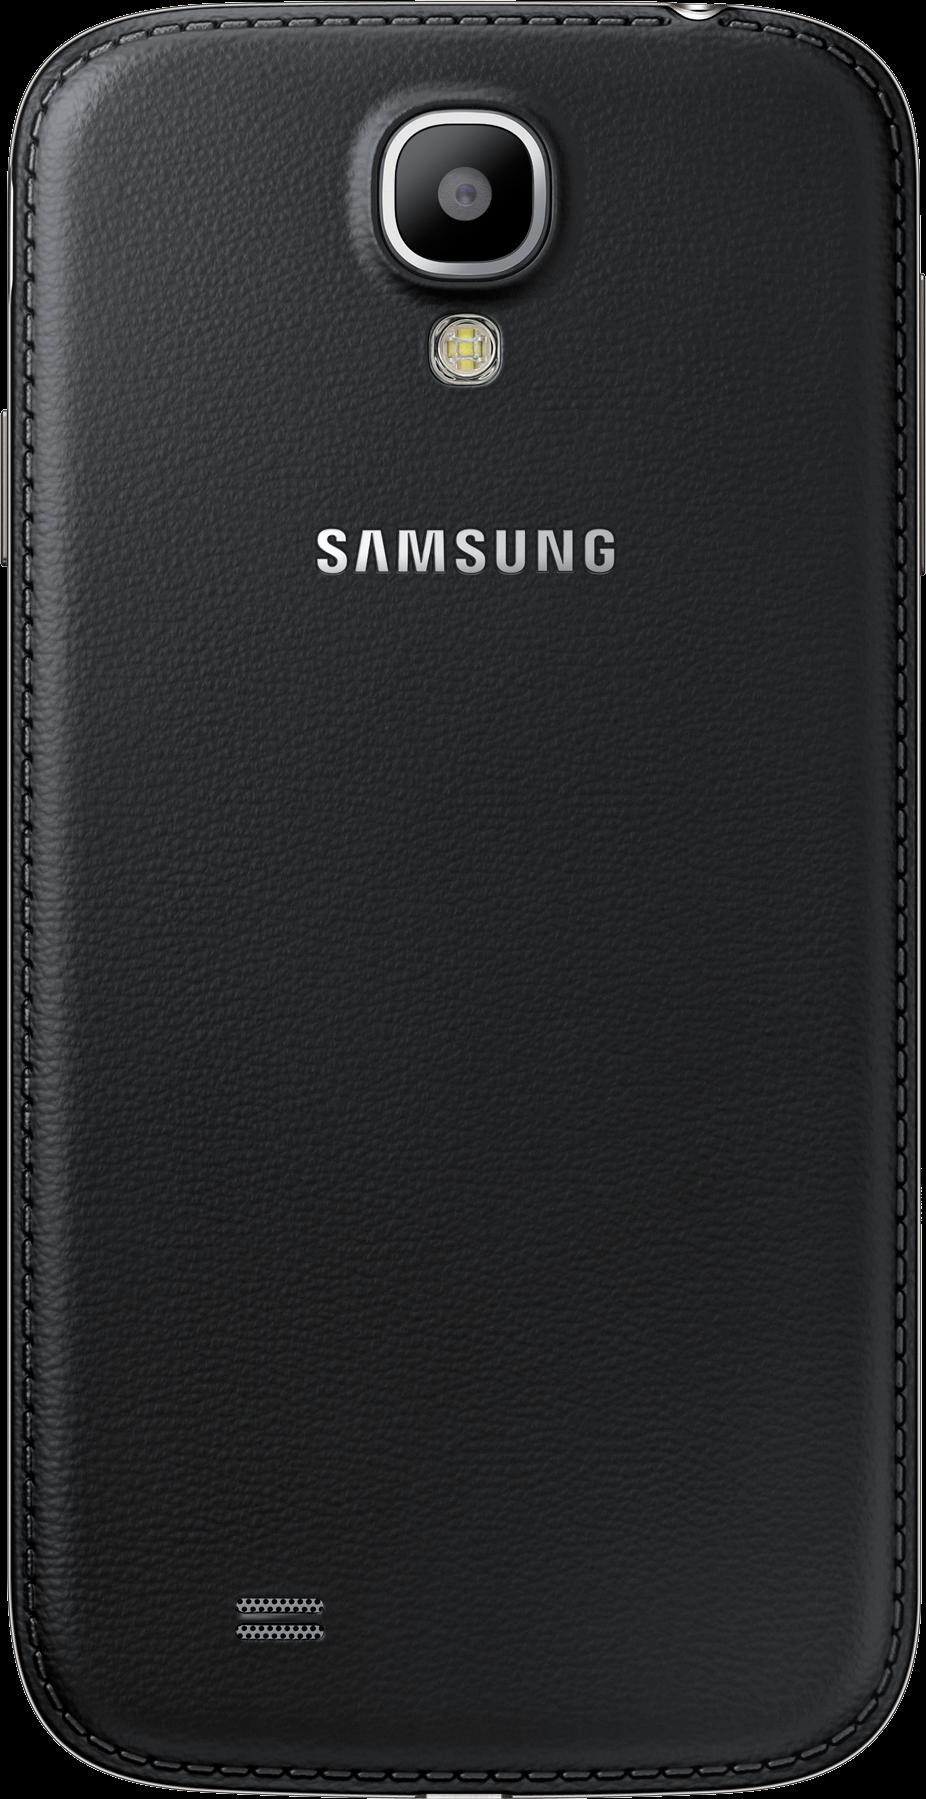 Samsung Galaxy S4 I9500 Công ty | CellphoneS.com.vn-12